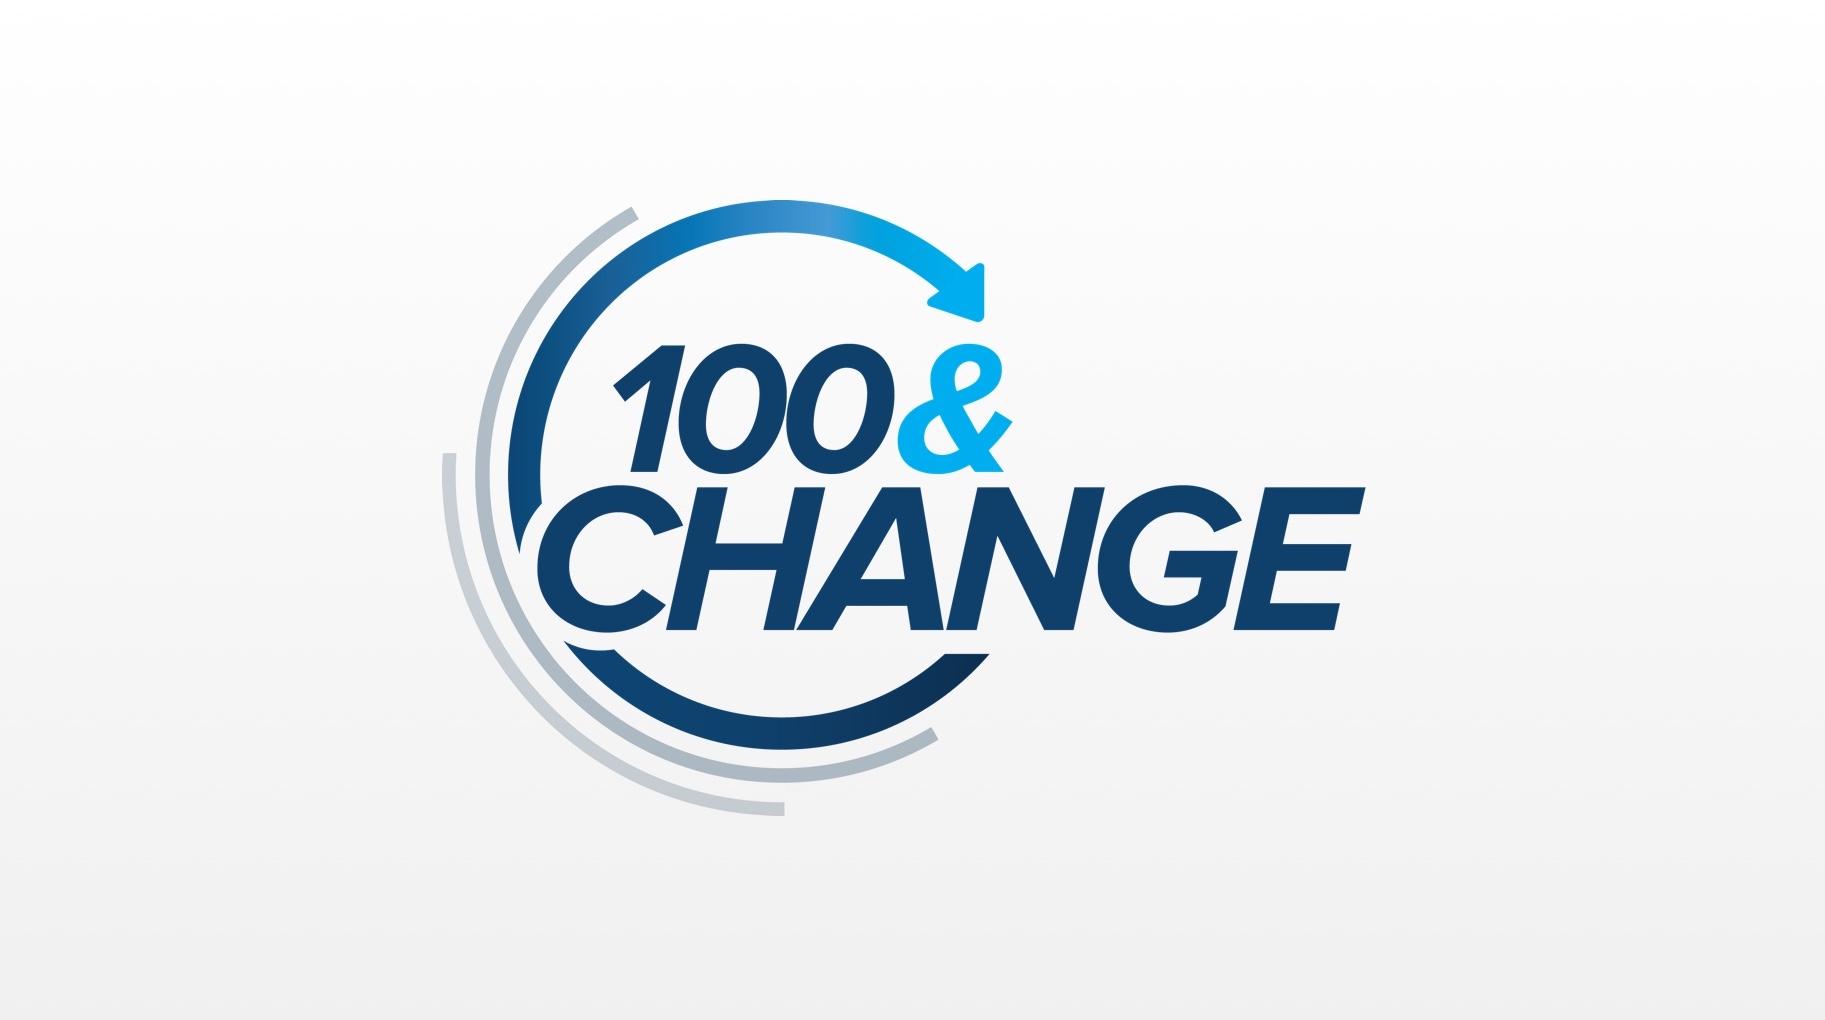 MacArthur Foundation 100&Change Competition 2019 ($100 million grant)